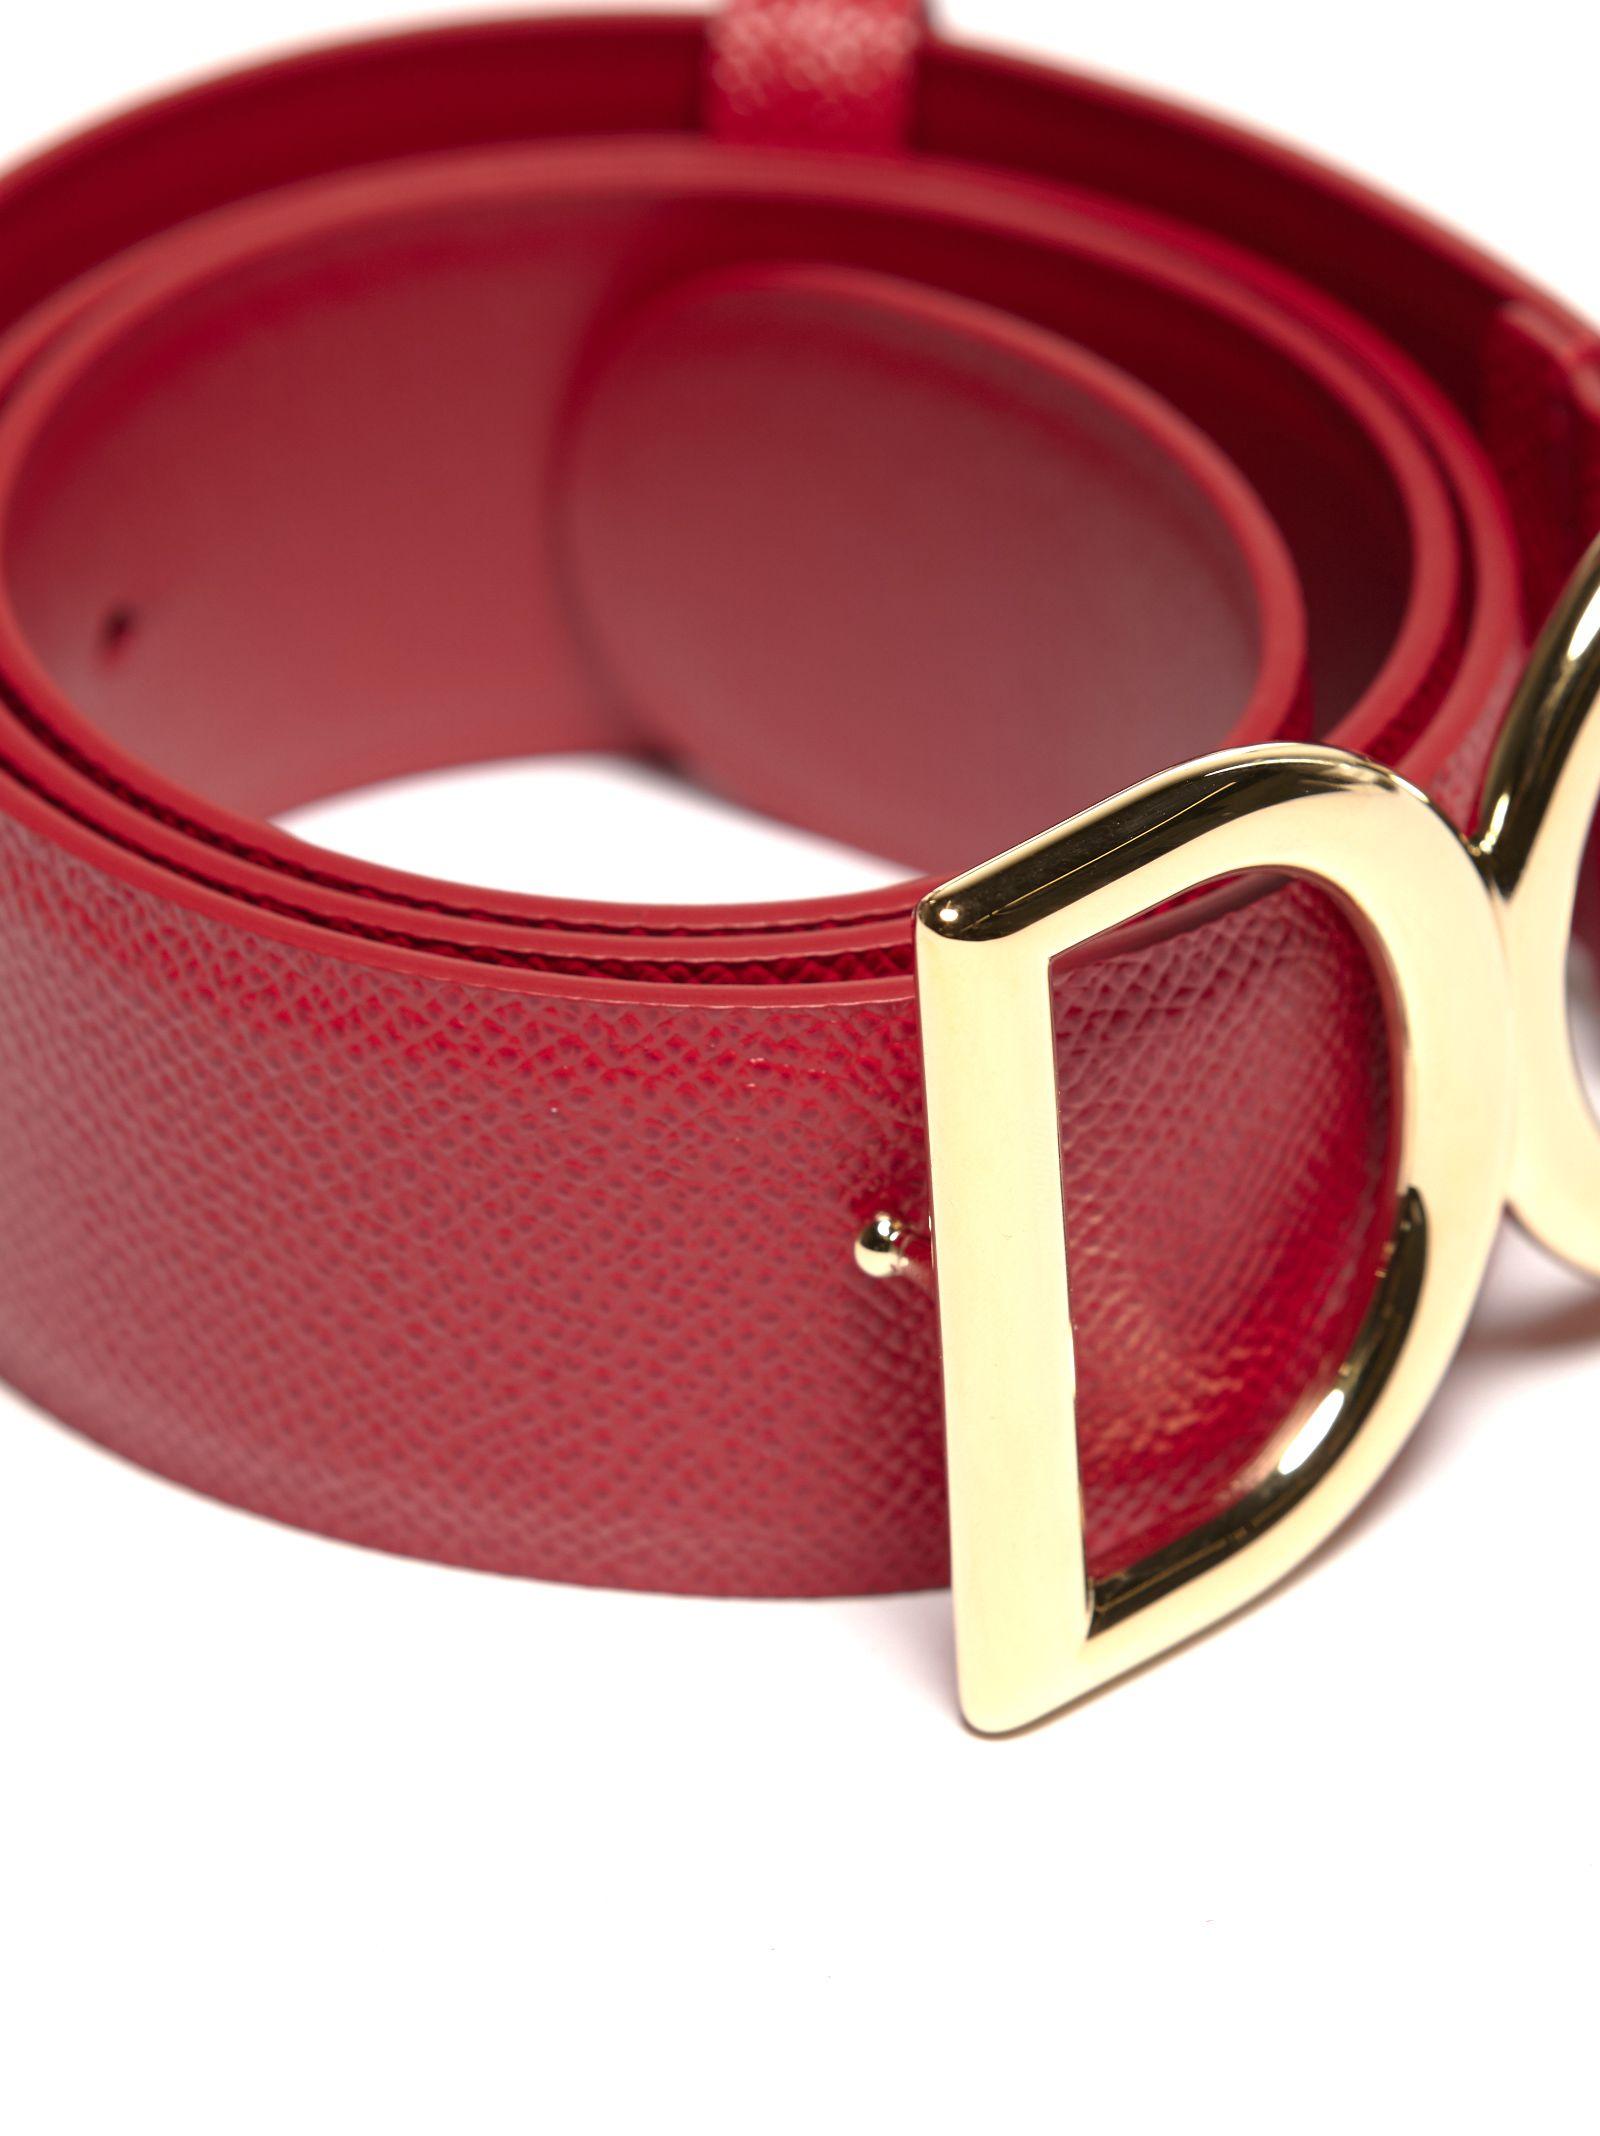 DG logo belt - Red Dolce & Gabbana vjFisX